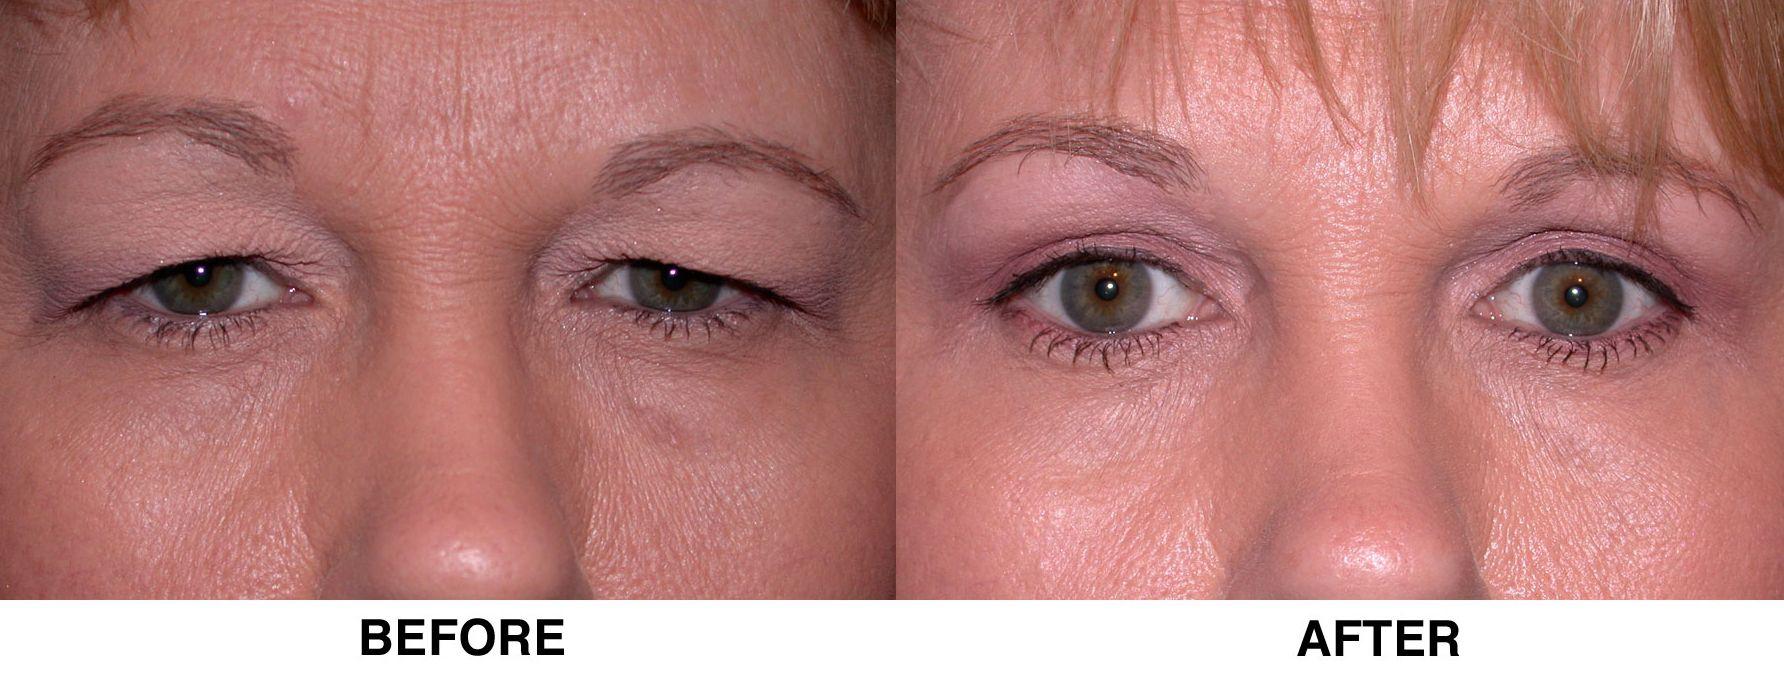 Andersen Eye Saginaw Surgical Blepharoplasty Eyelid Surgery